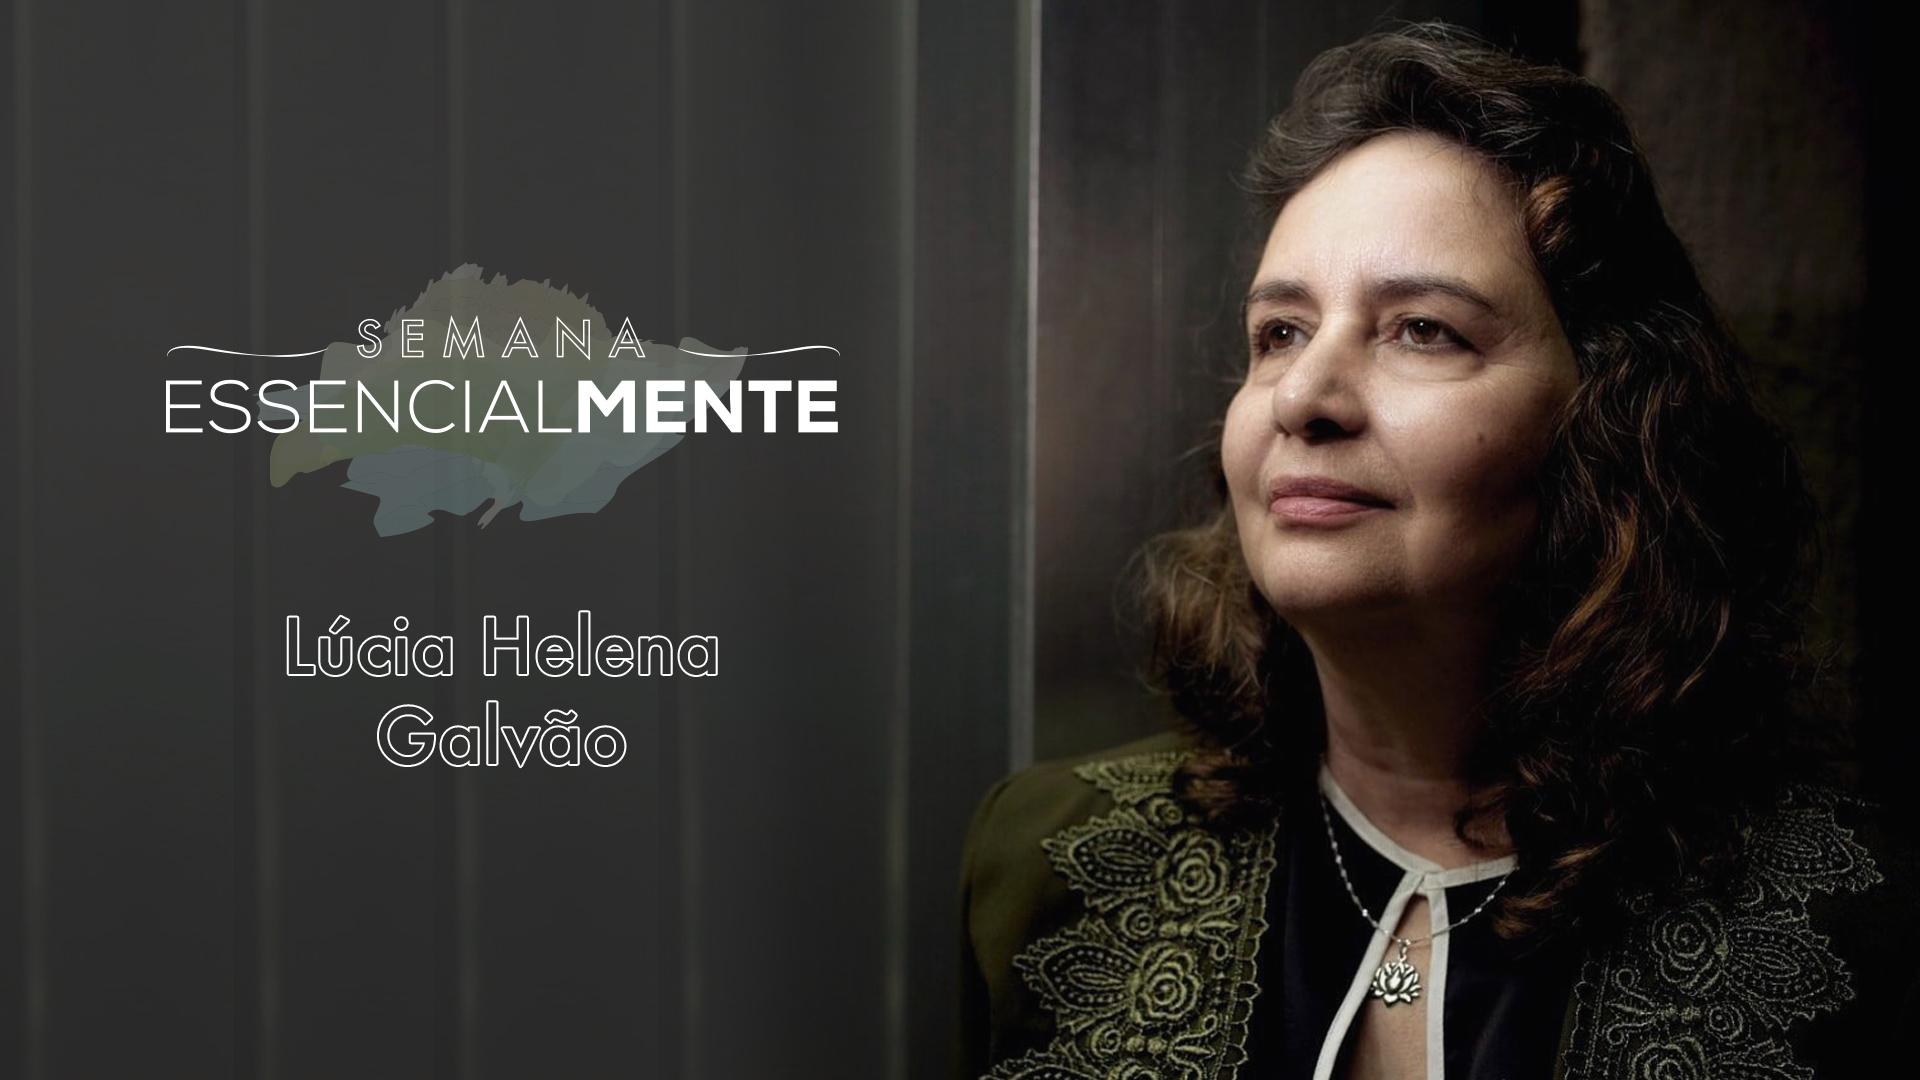 Semana Essencialmente: veja a mini palestra de Lúcia Helena Galvão na íntegra